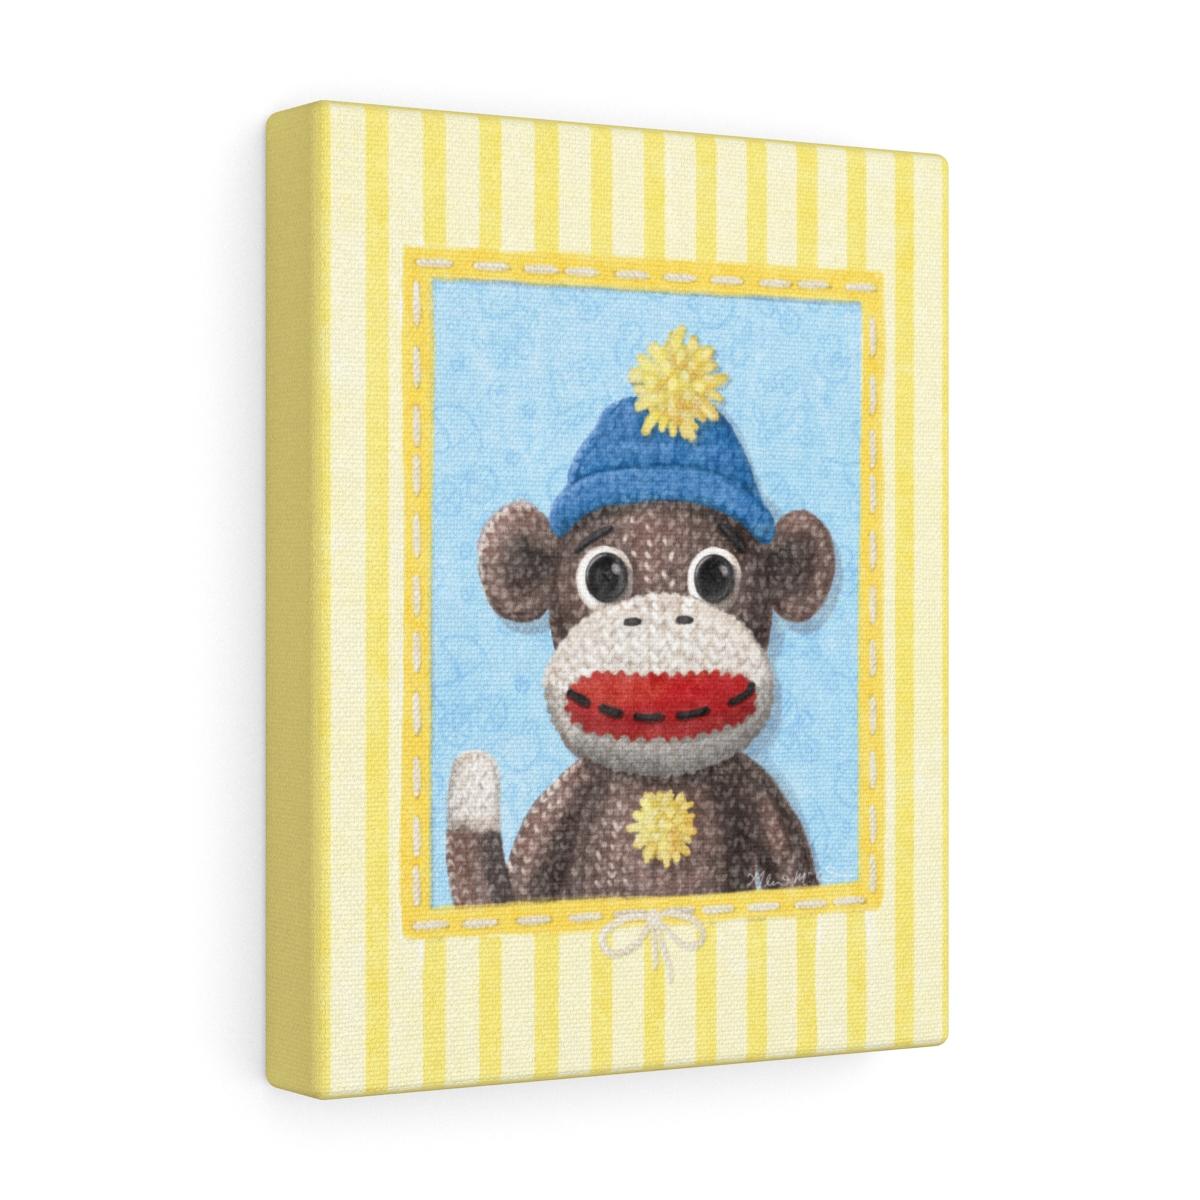 Charlie the Sock Monkey - Canvas Gallery Wraps - Big Mural Design Studio